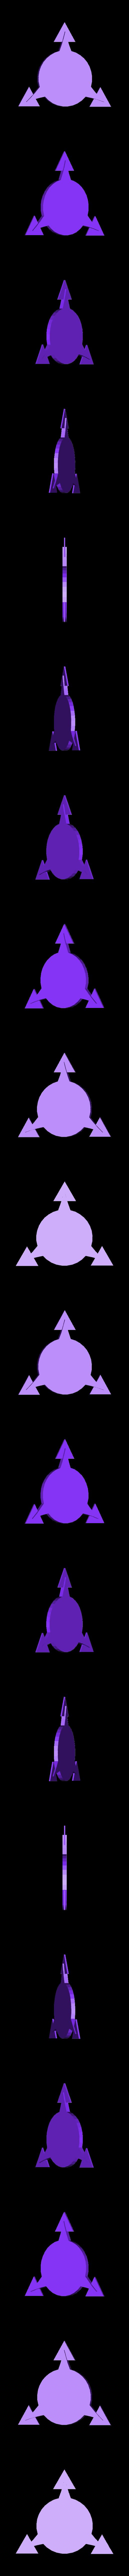 CIRCLE Triangle-Dent flexipick 1'15 07 -oo-.stl Download free STL file Triangle-Dent Circle'Piramidal - Electric Guitar Stick & Bass • 3D printer template, carleslluisar